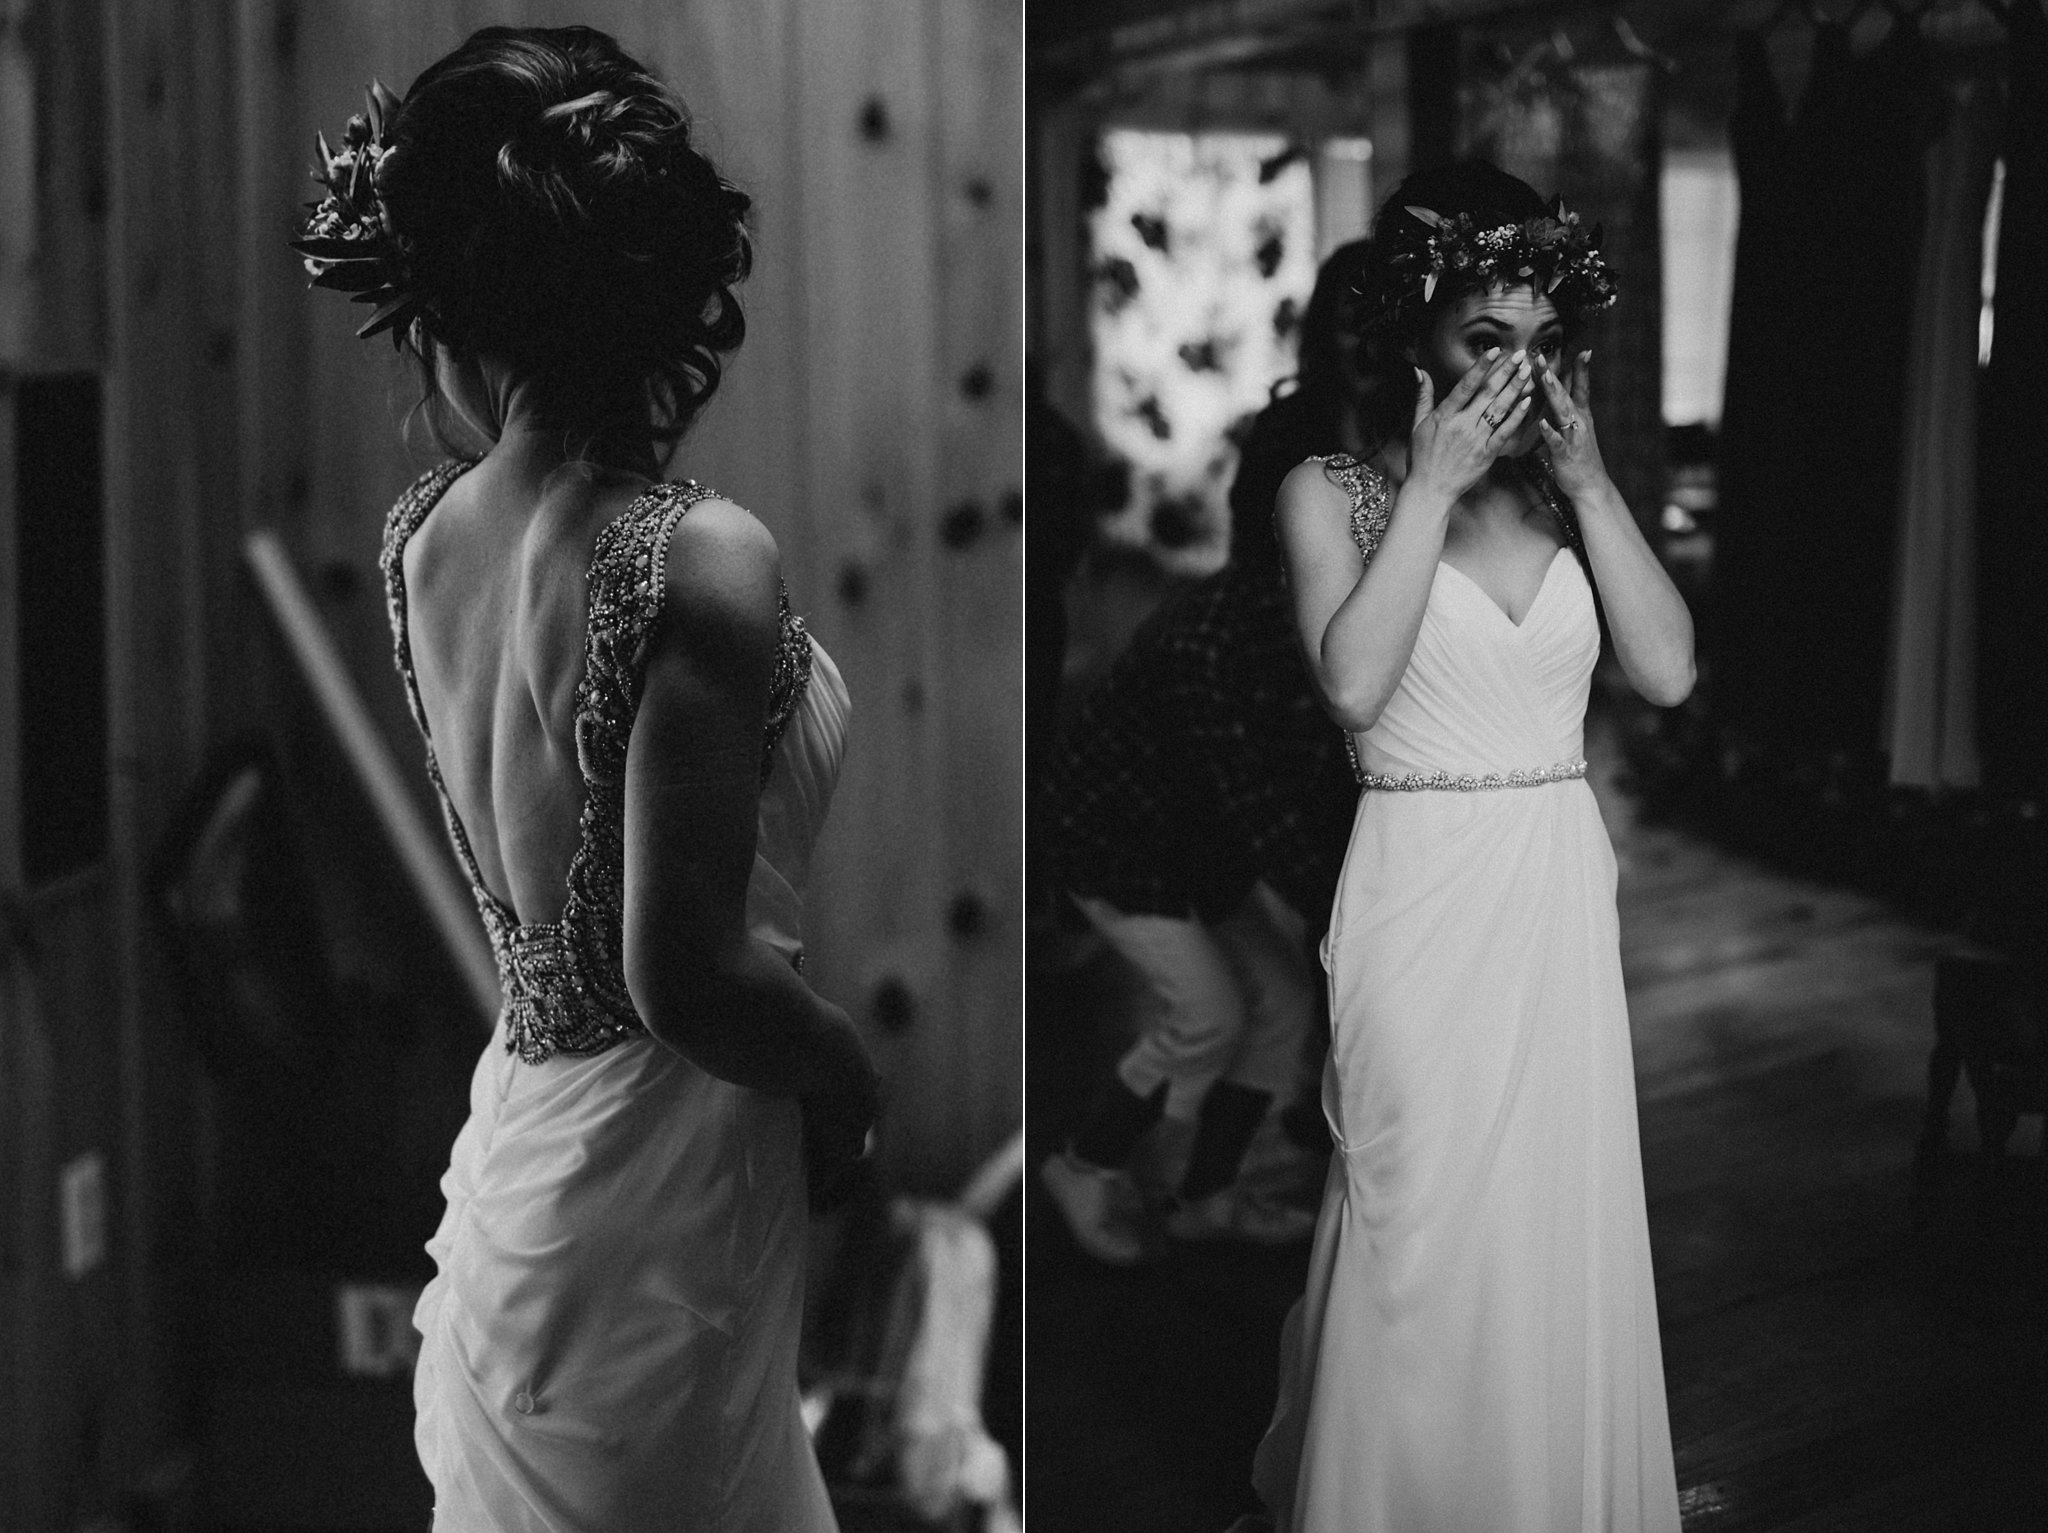 kaihla_tonai_intimate_wedding_elopement_photographer_6564.jpg